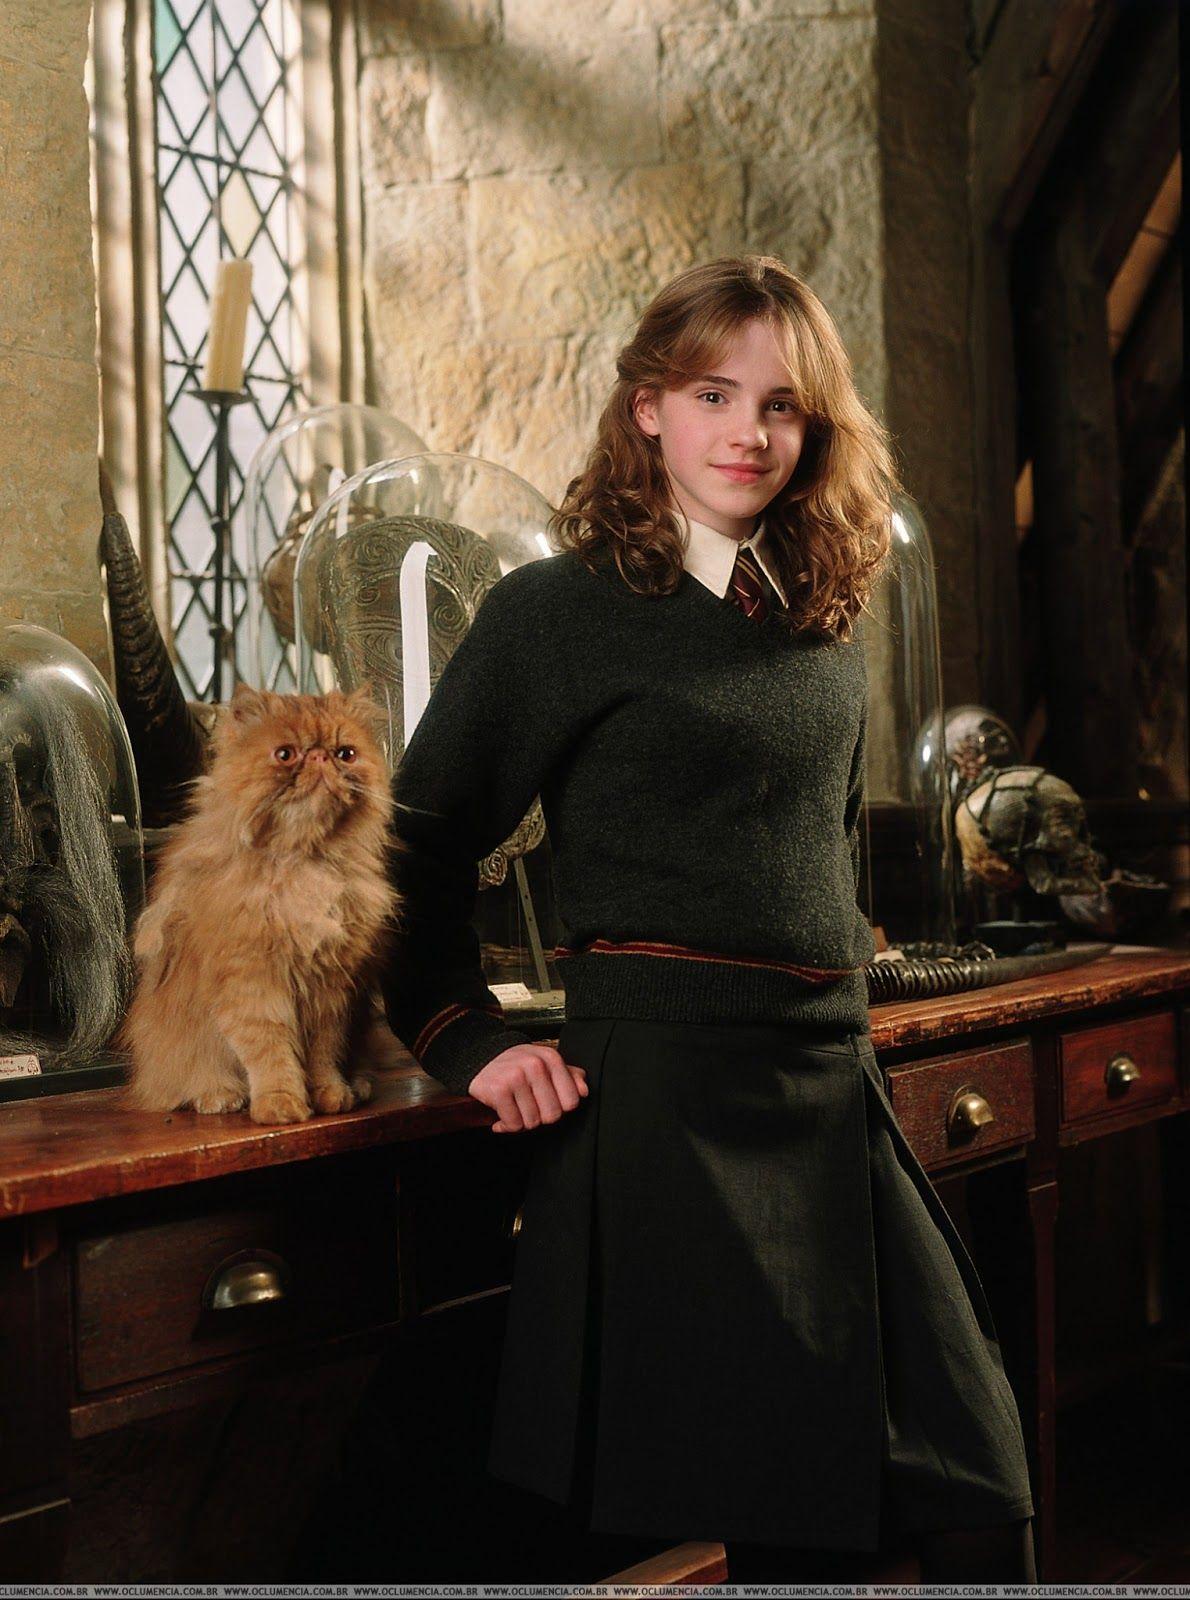 Harry Potter images prisoner of azkaban promo pics